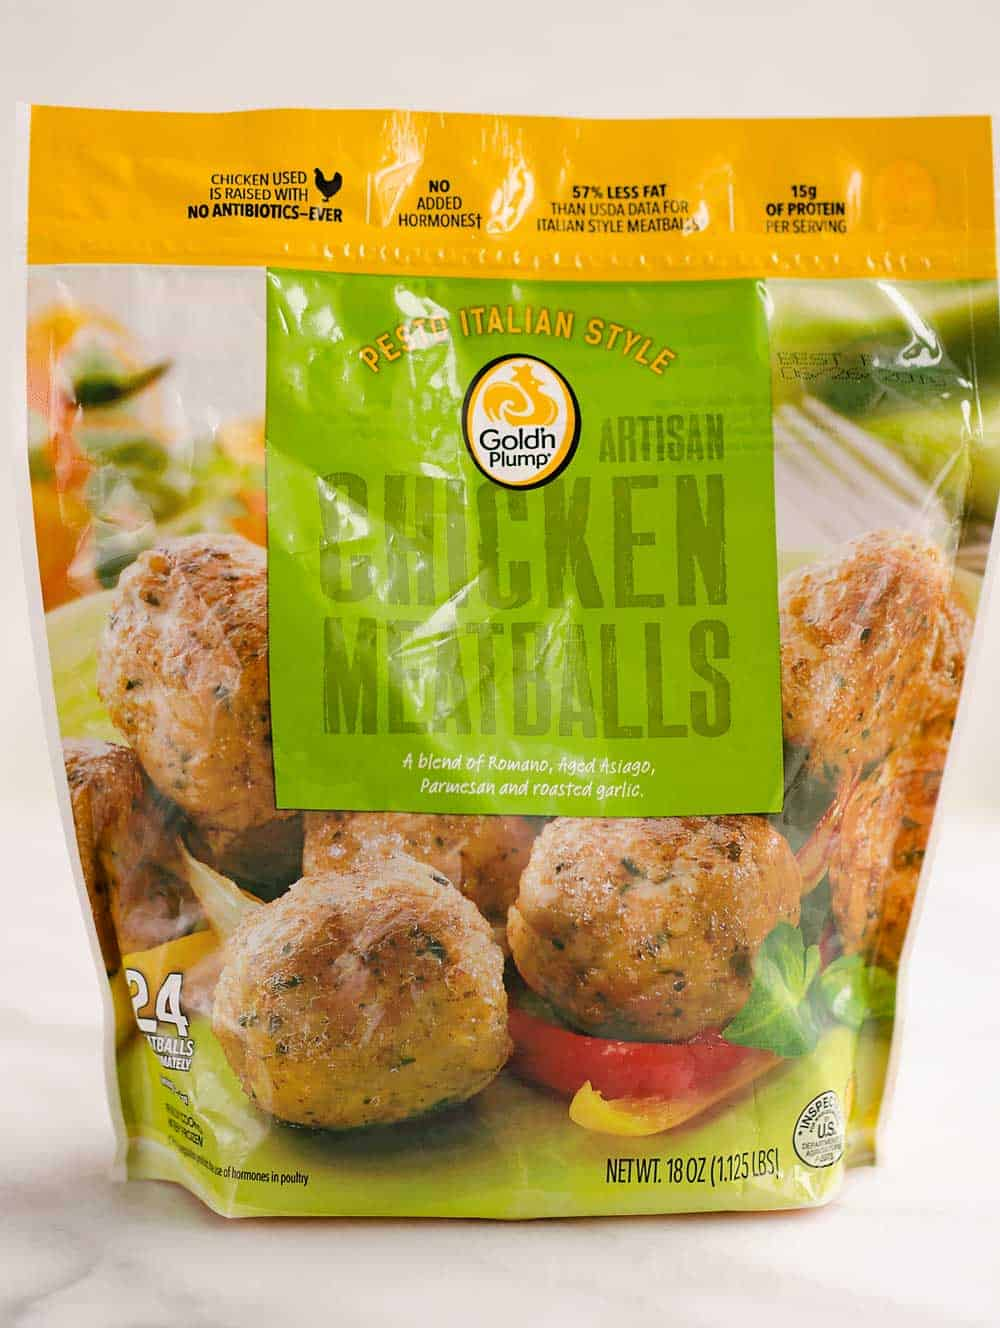 Gold'n Plump Pesto Italian Style Chicken Meatballs in bag